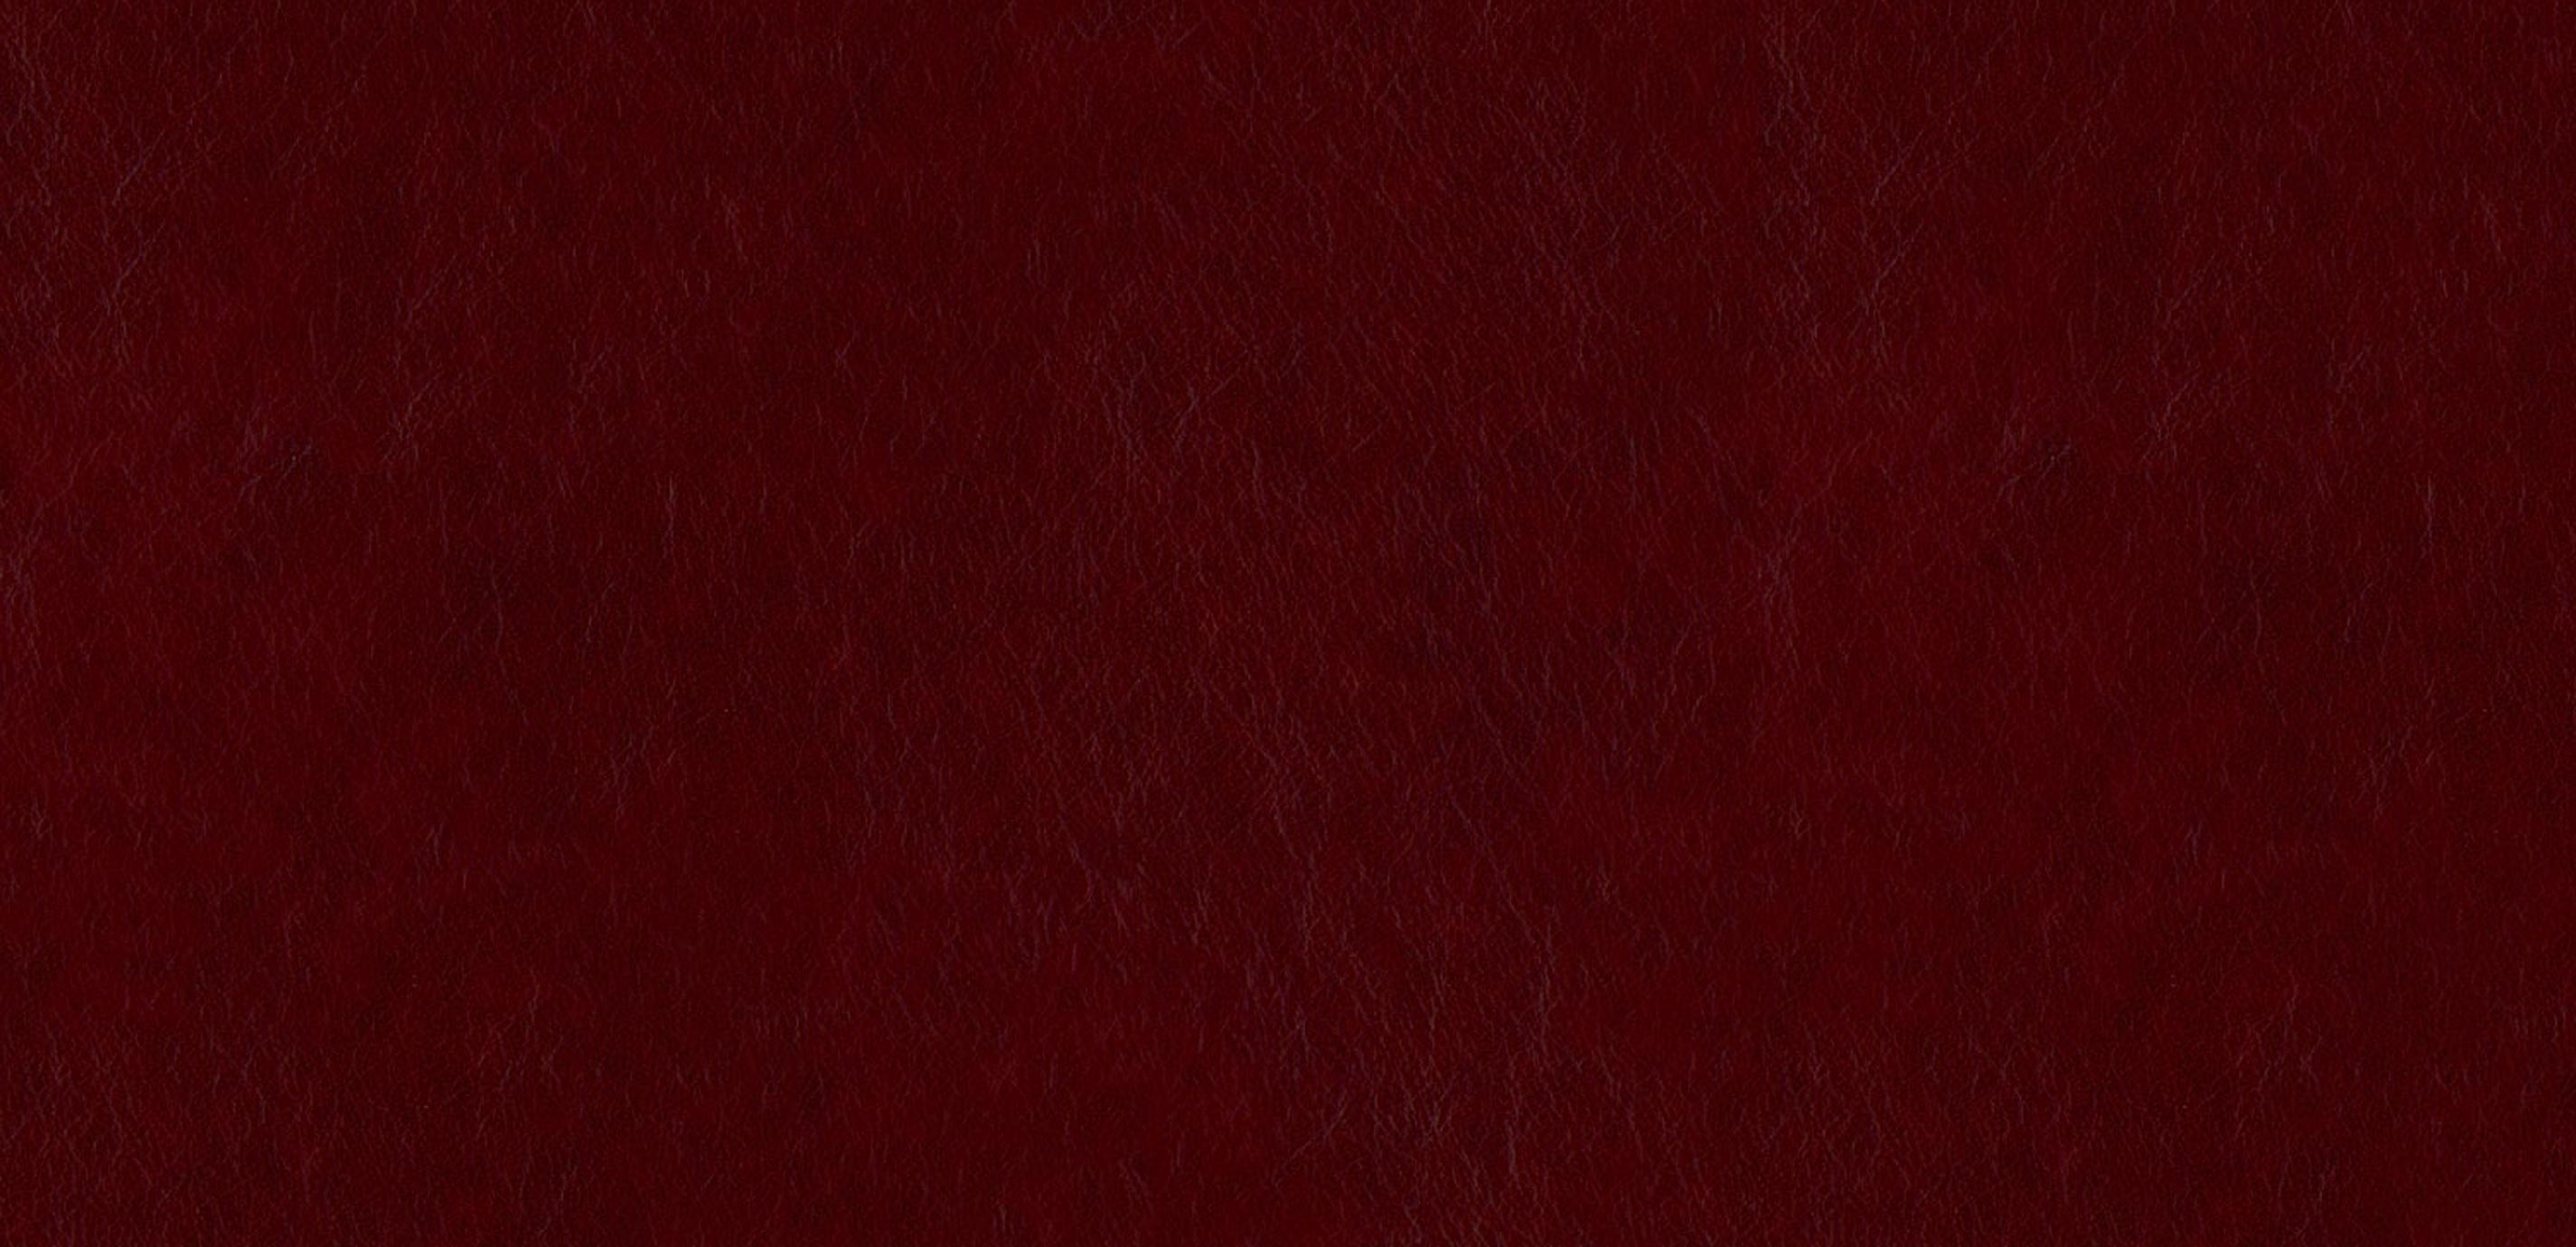 Anson Red Leather Swatch Ethan Allen Ethan Allen